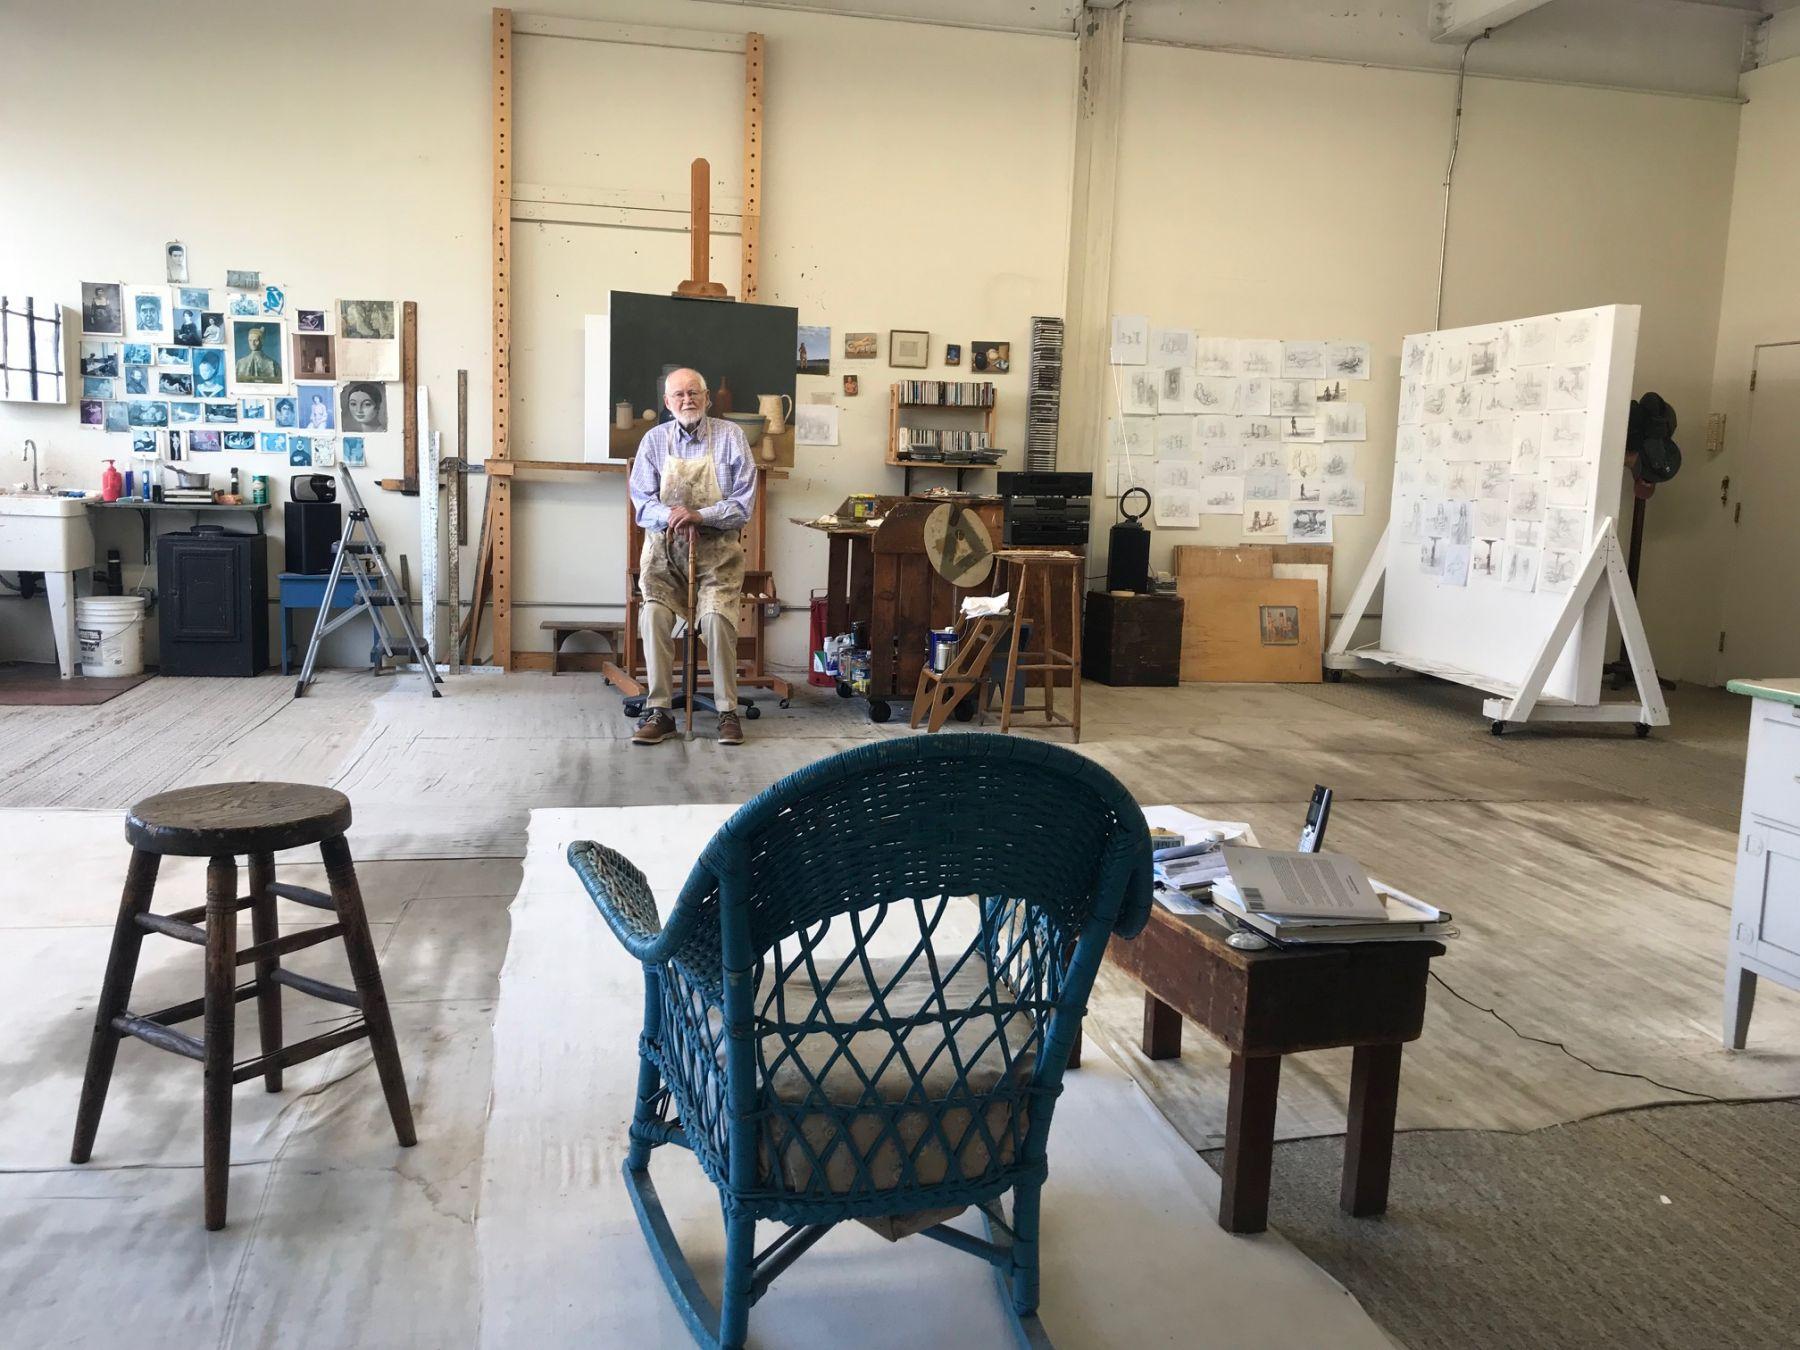 Image of Bill's Studio 2